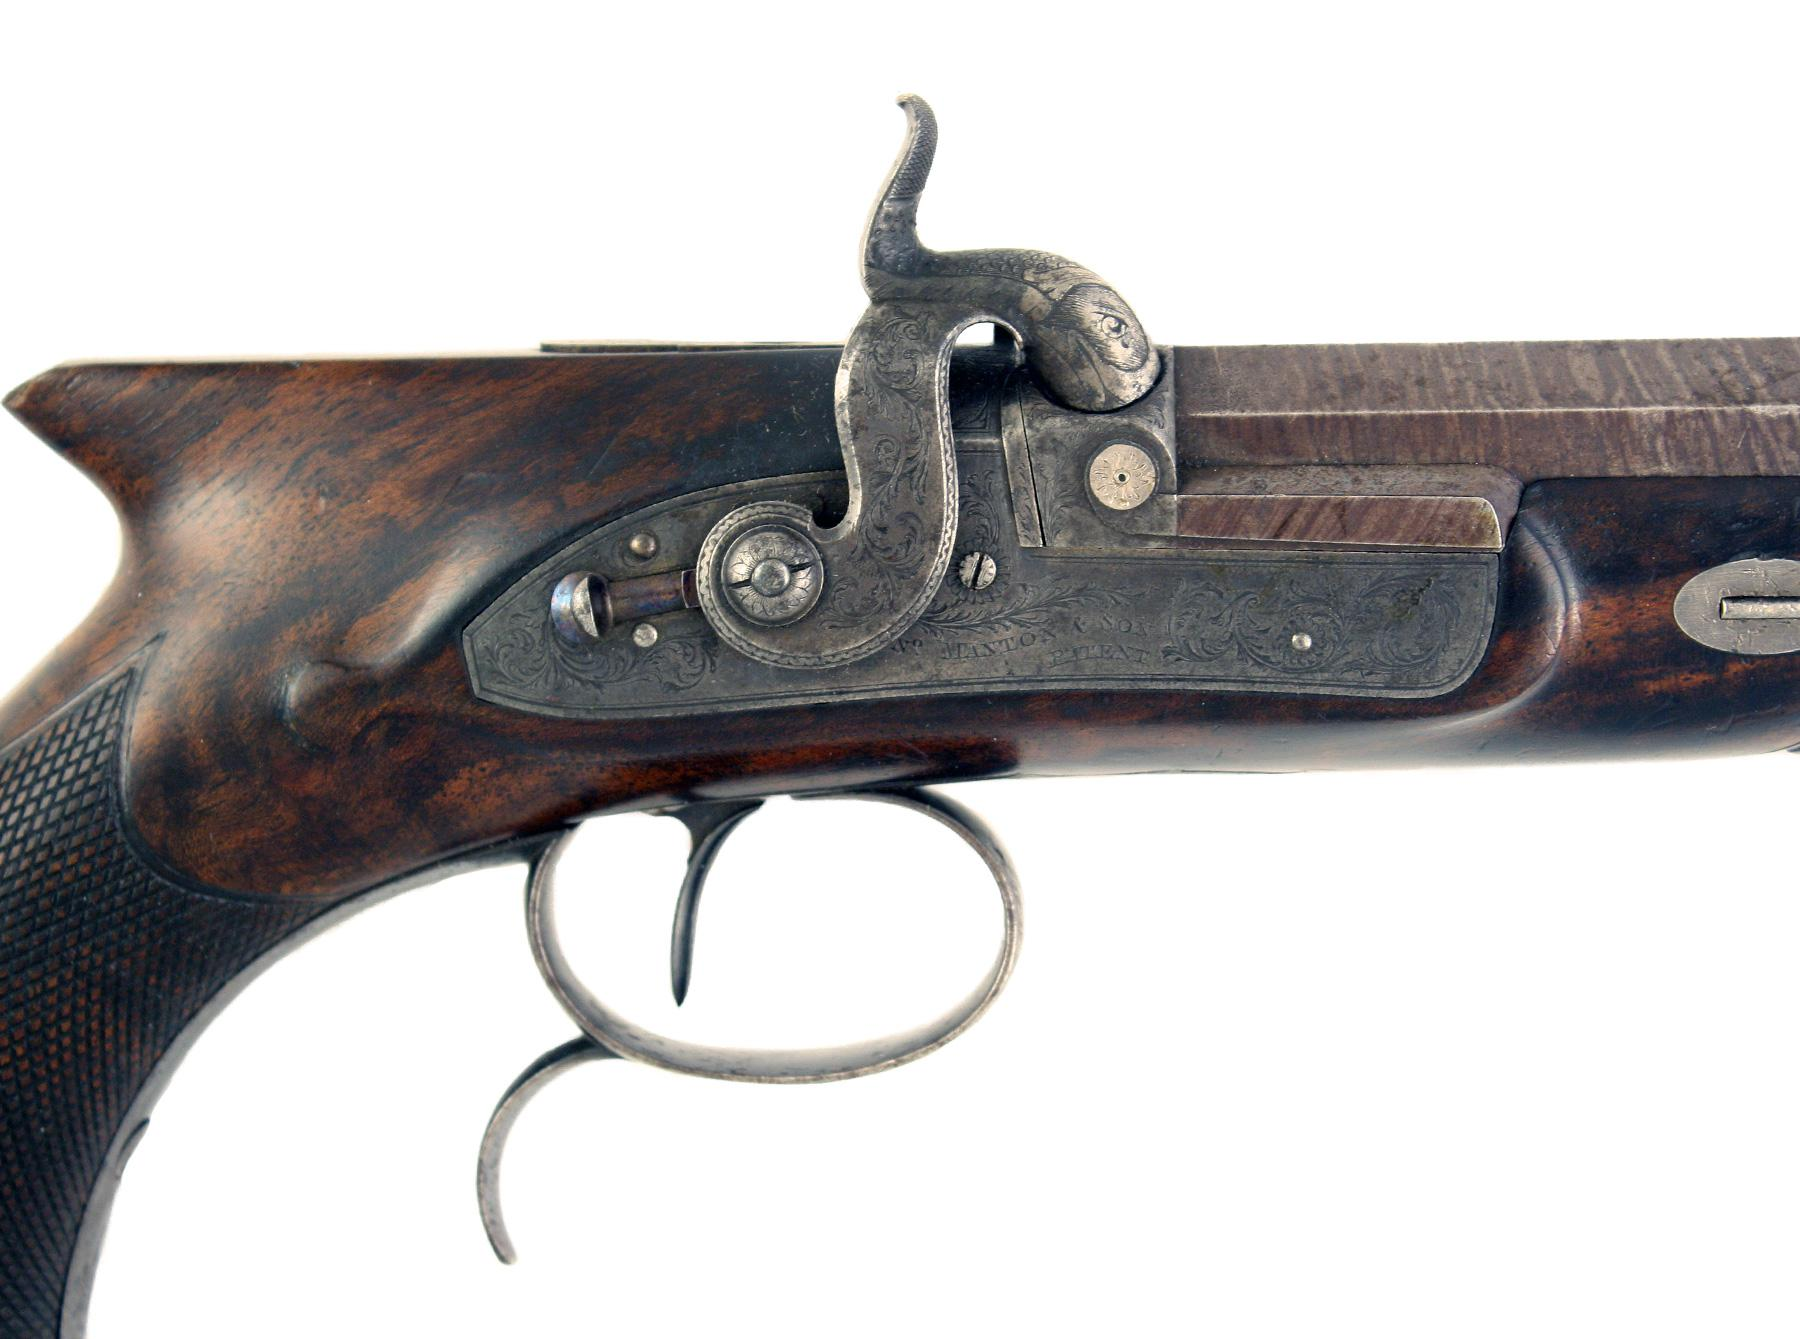 A Manton Duelling Pistol